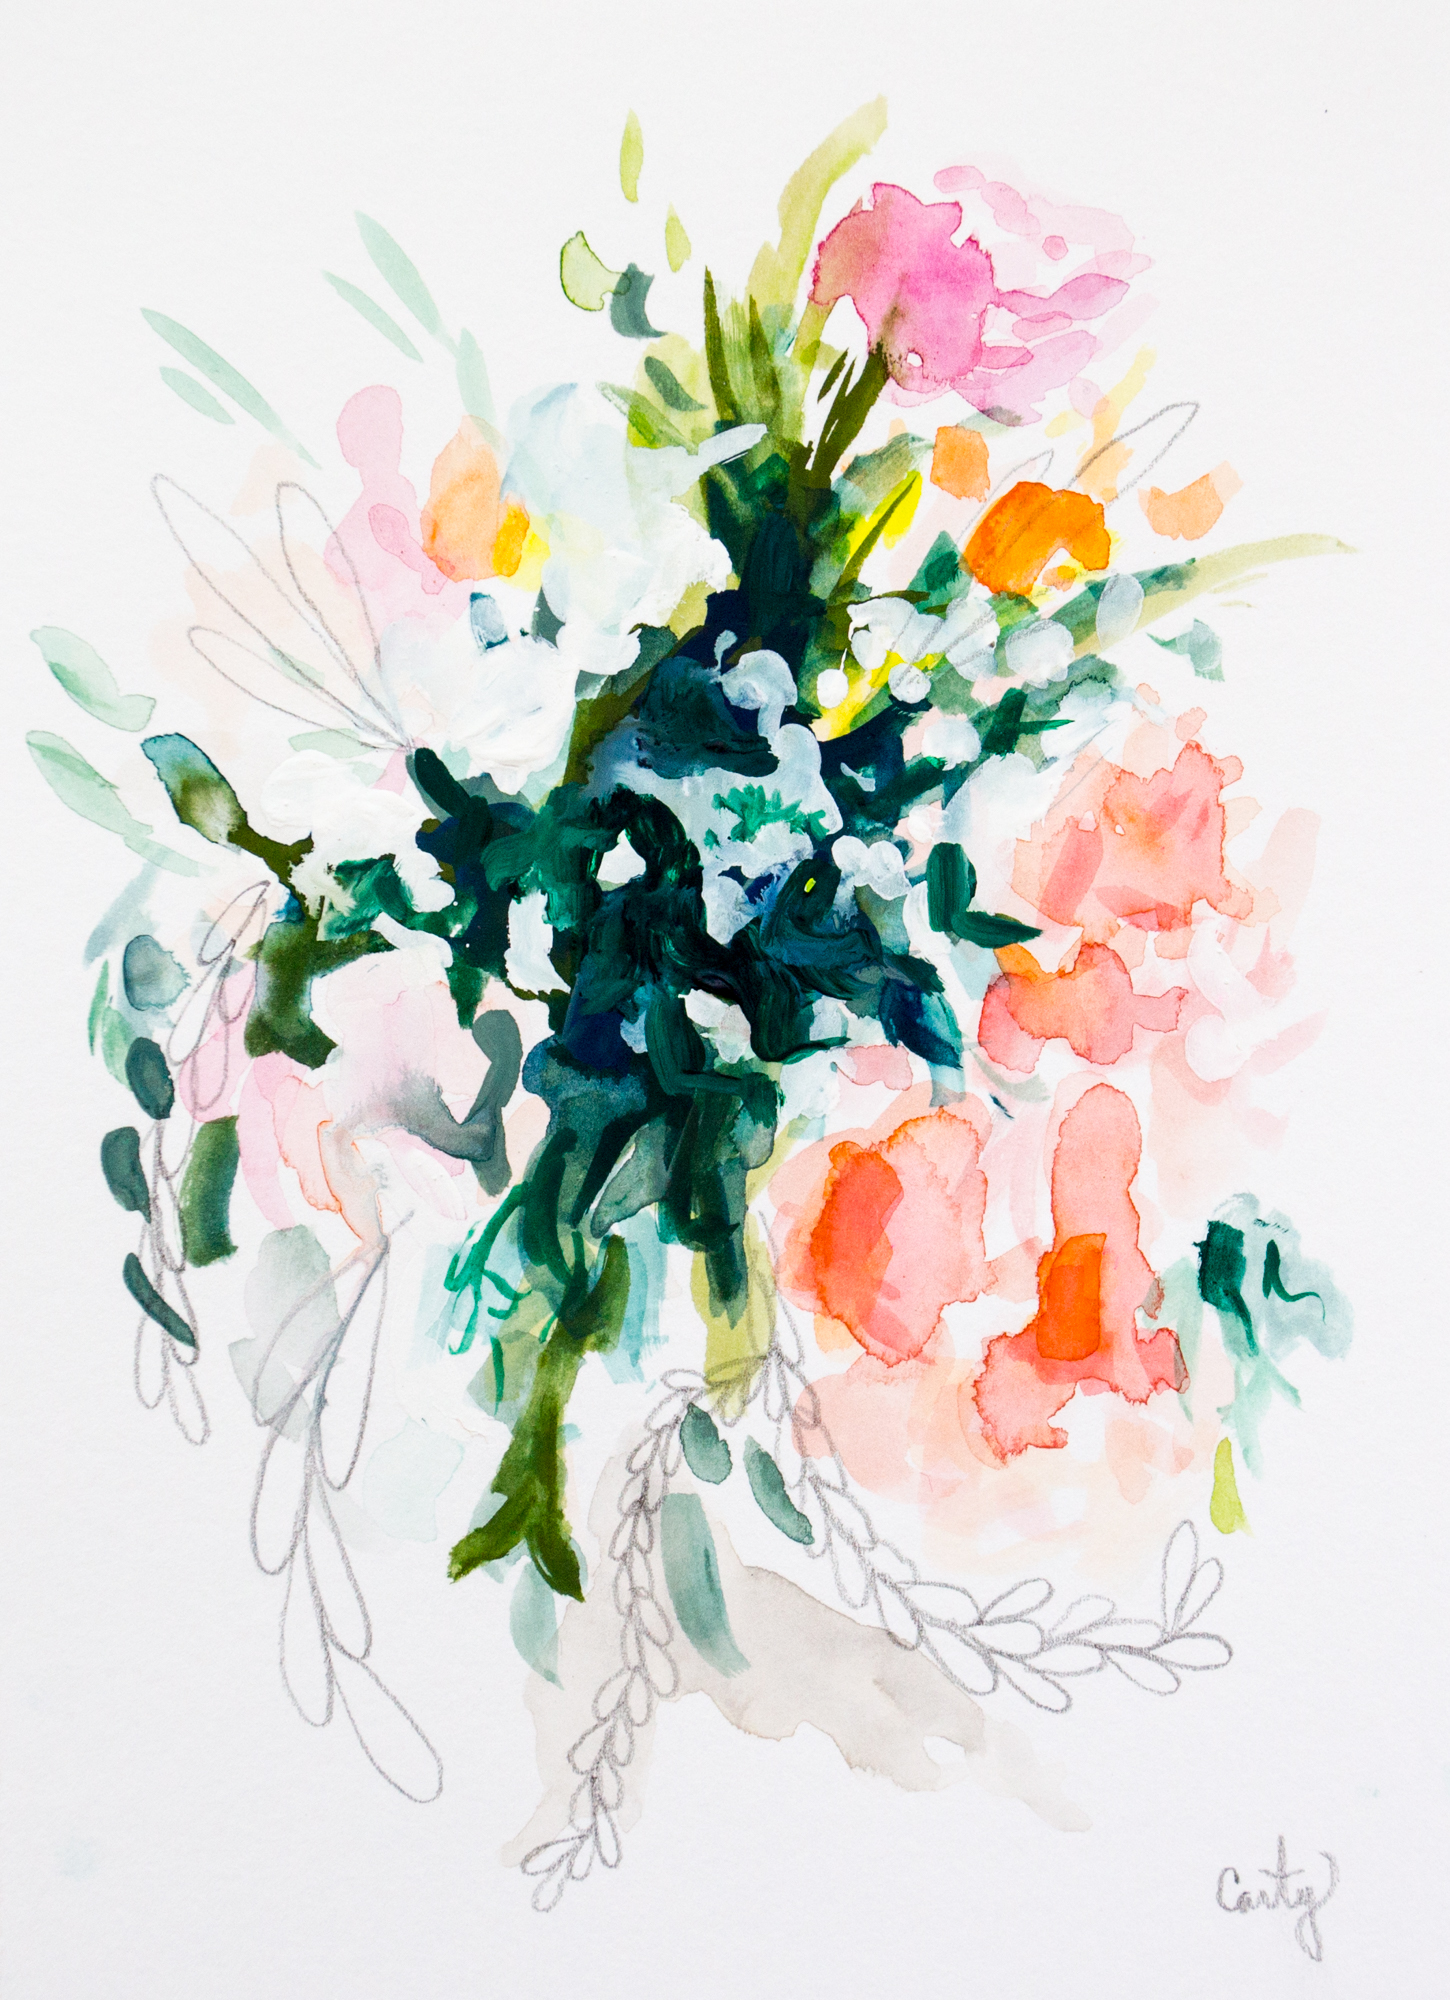 spring league 5x7 abstract